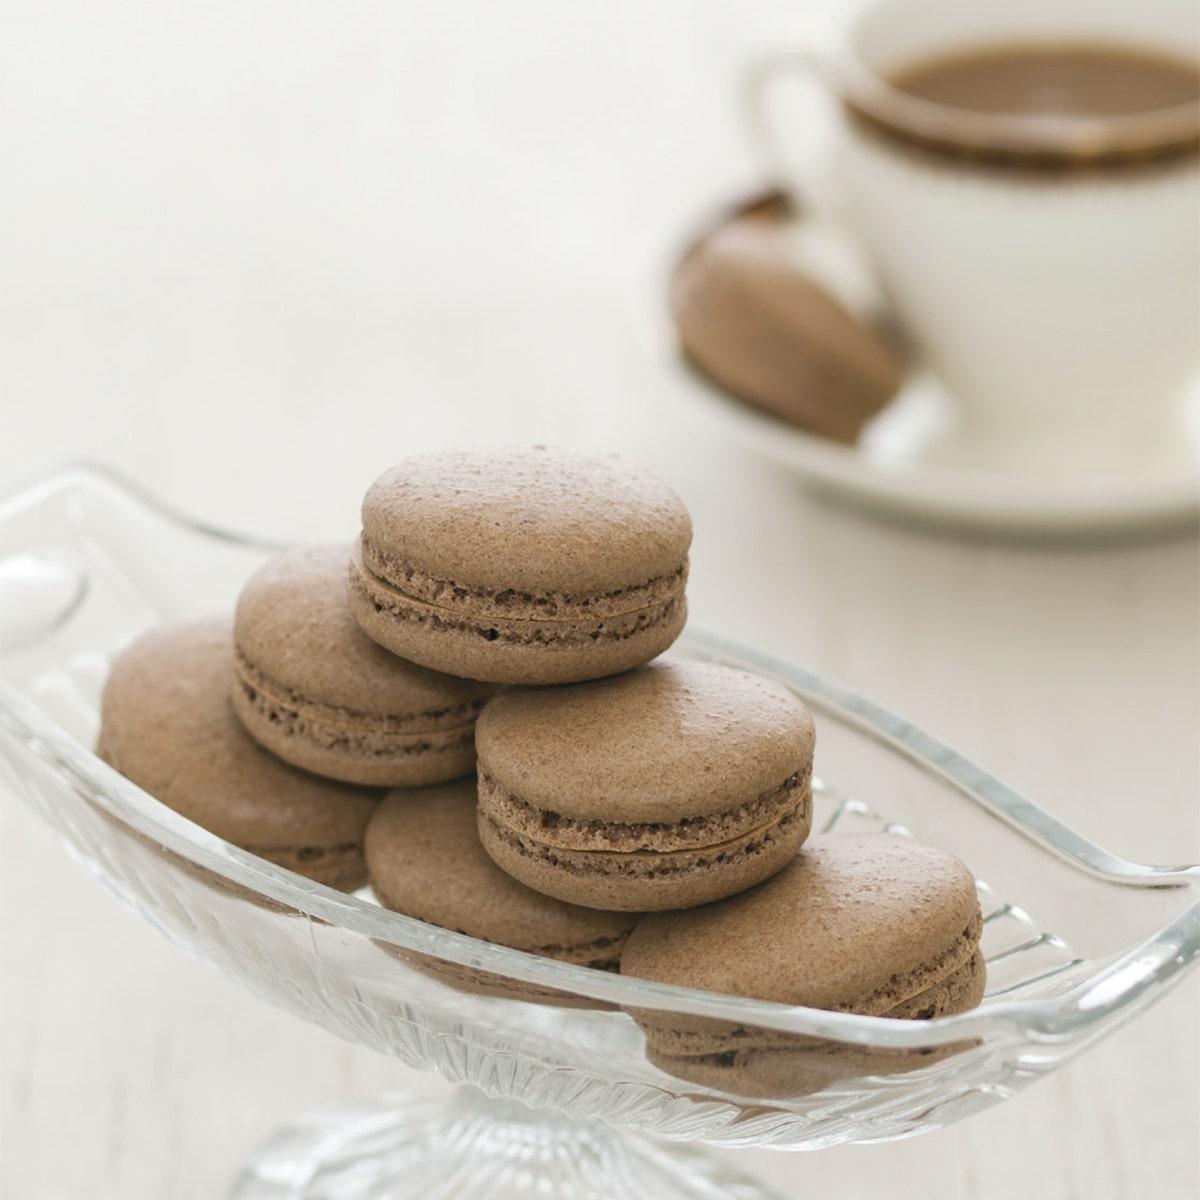 Haigh's Chocolate Macarons